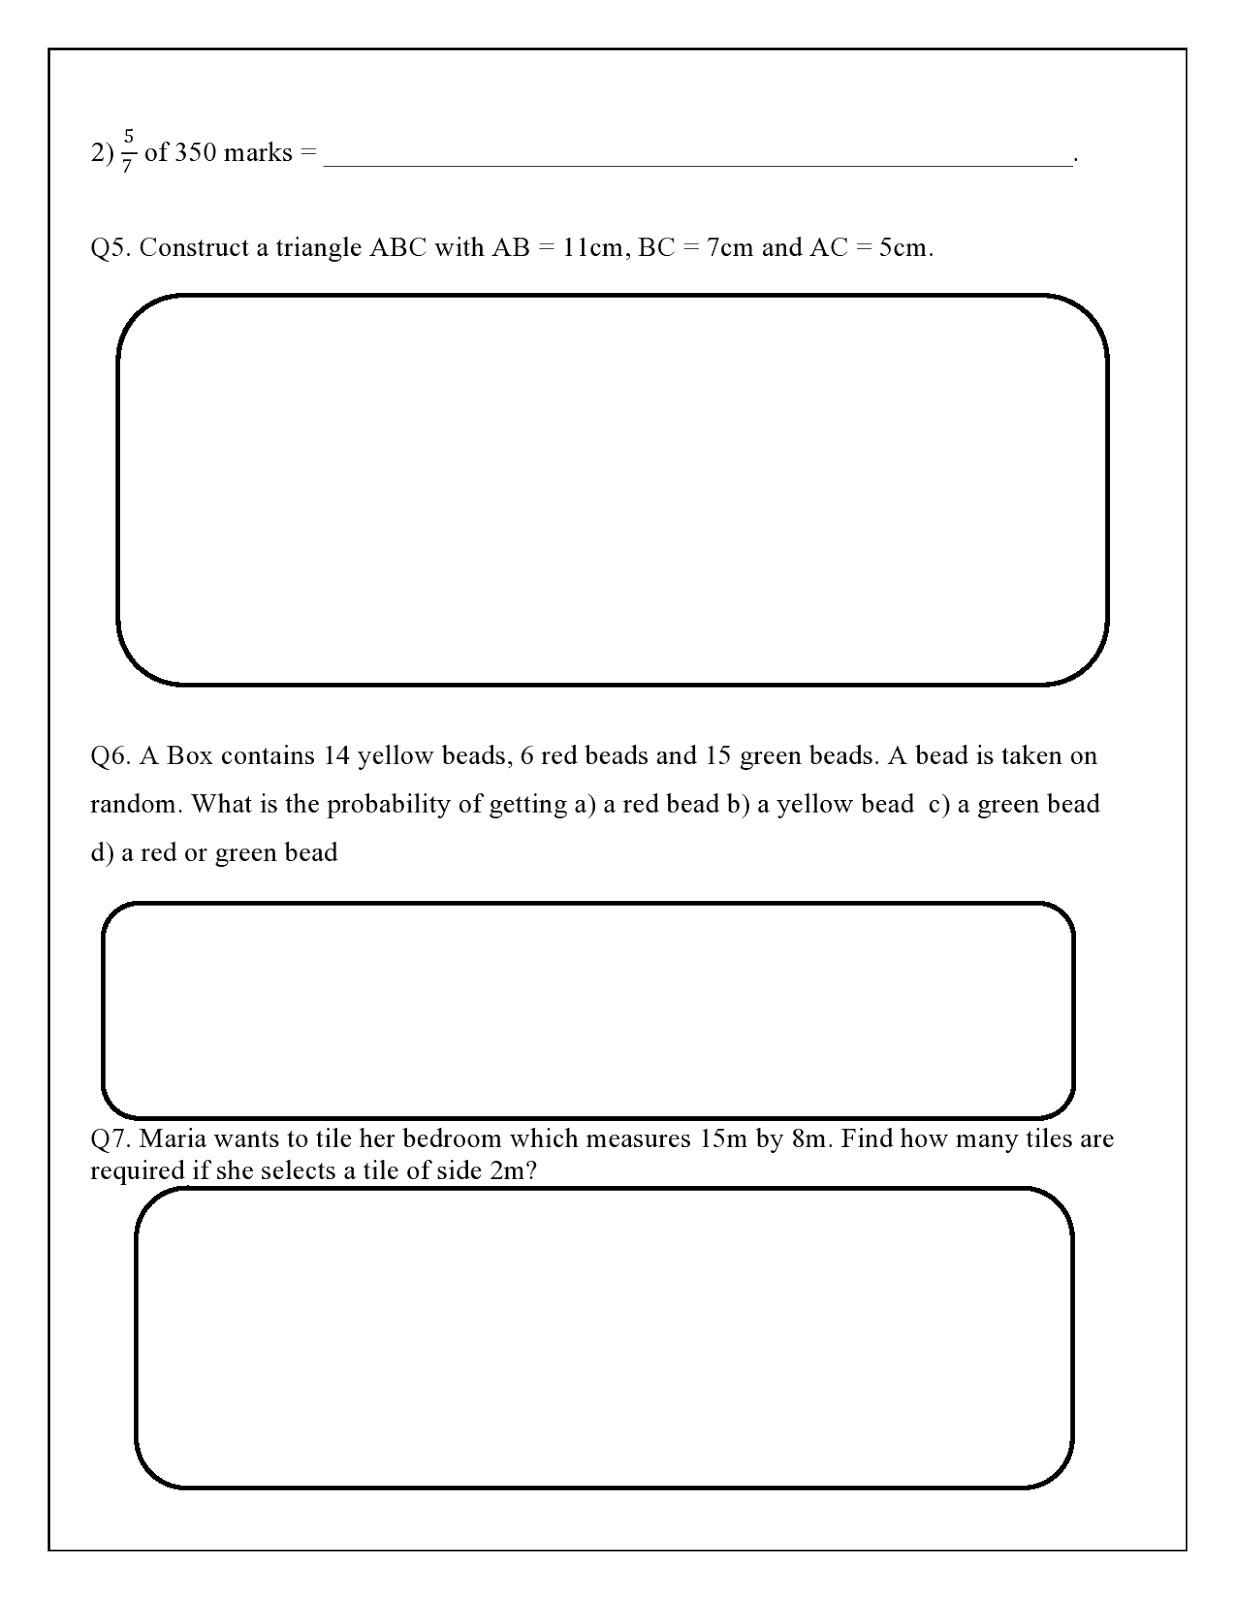 medium resolution of WORLD SCHOOL OMAN: Revision Worksheets for Grade 7 as on 09-05-2019